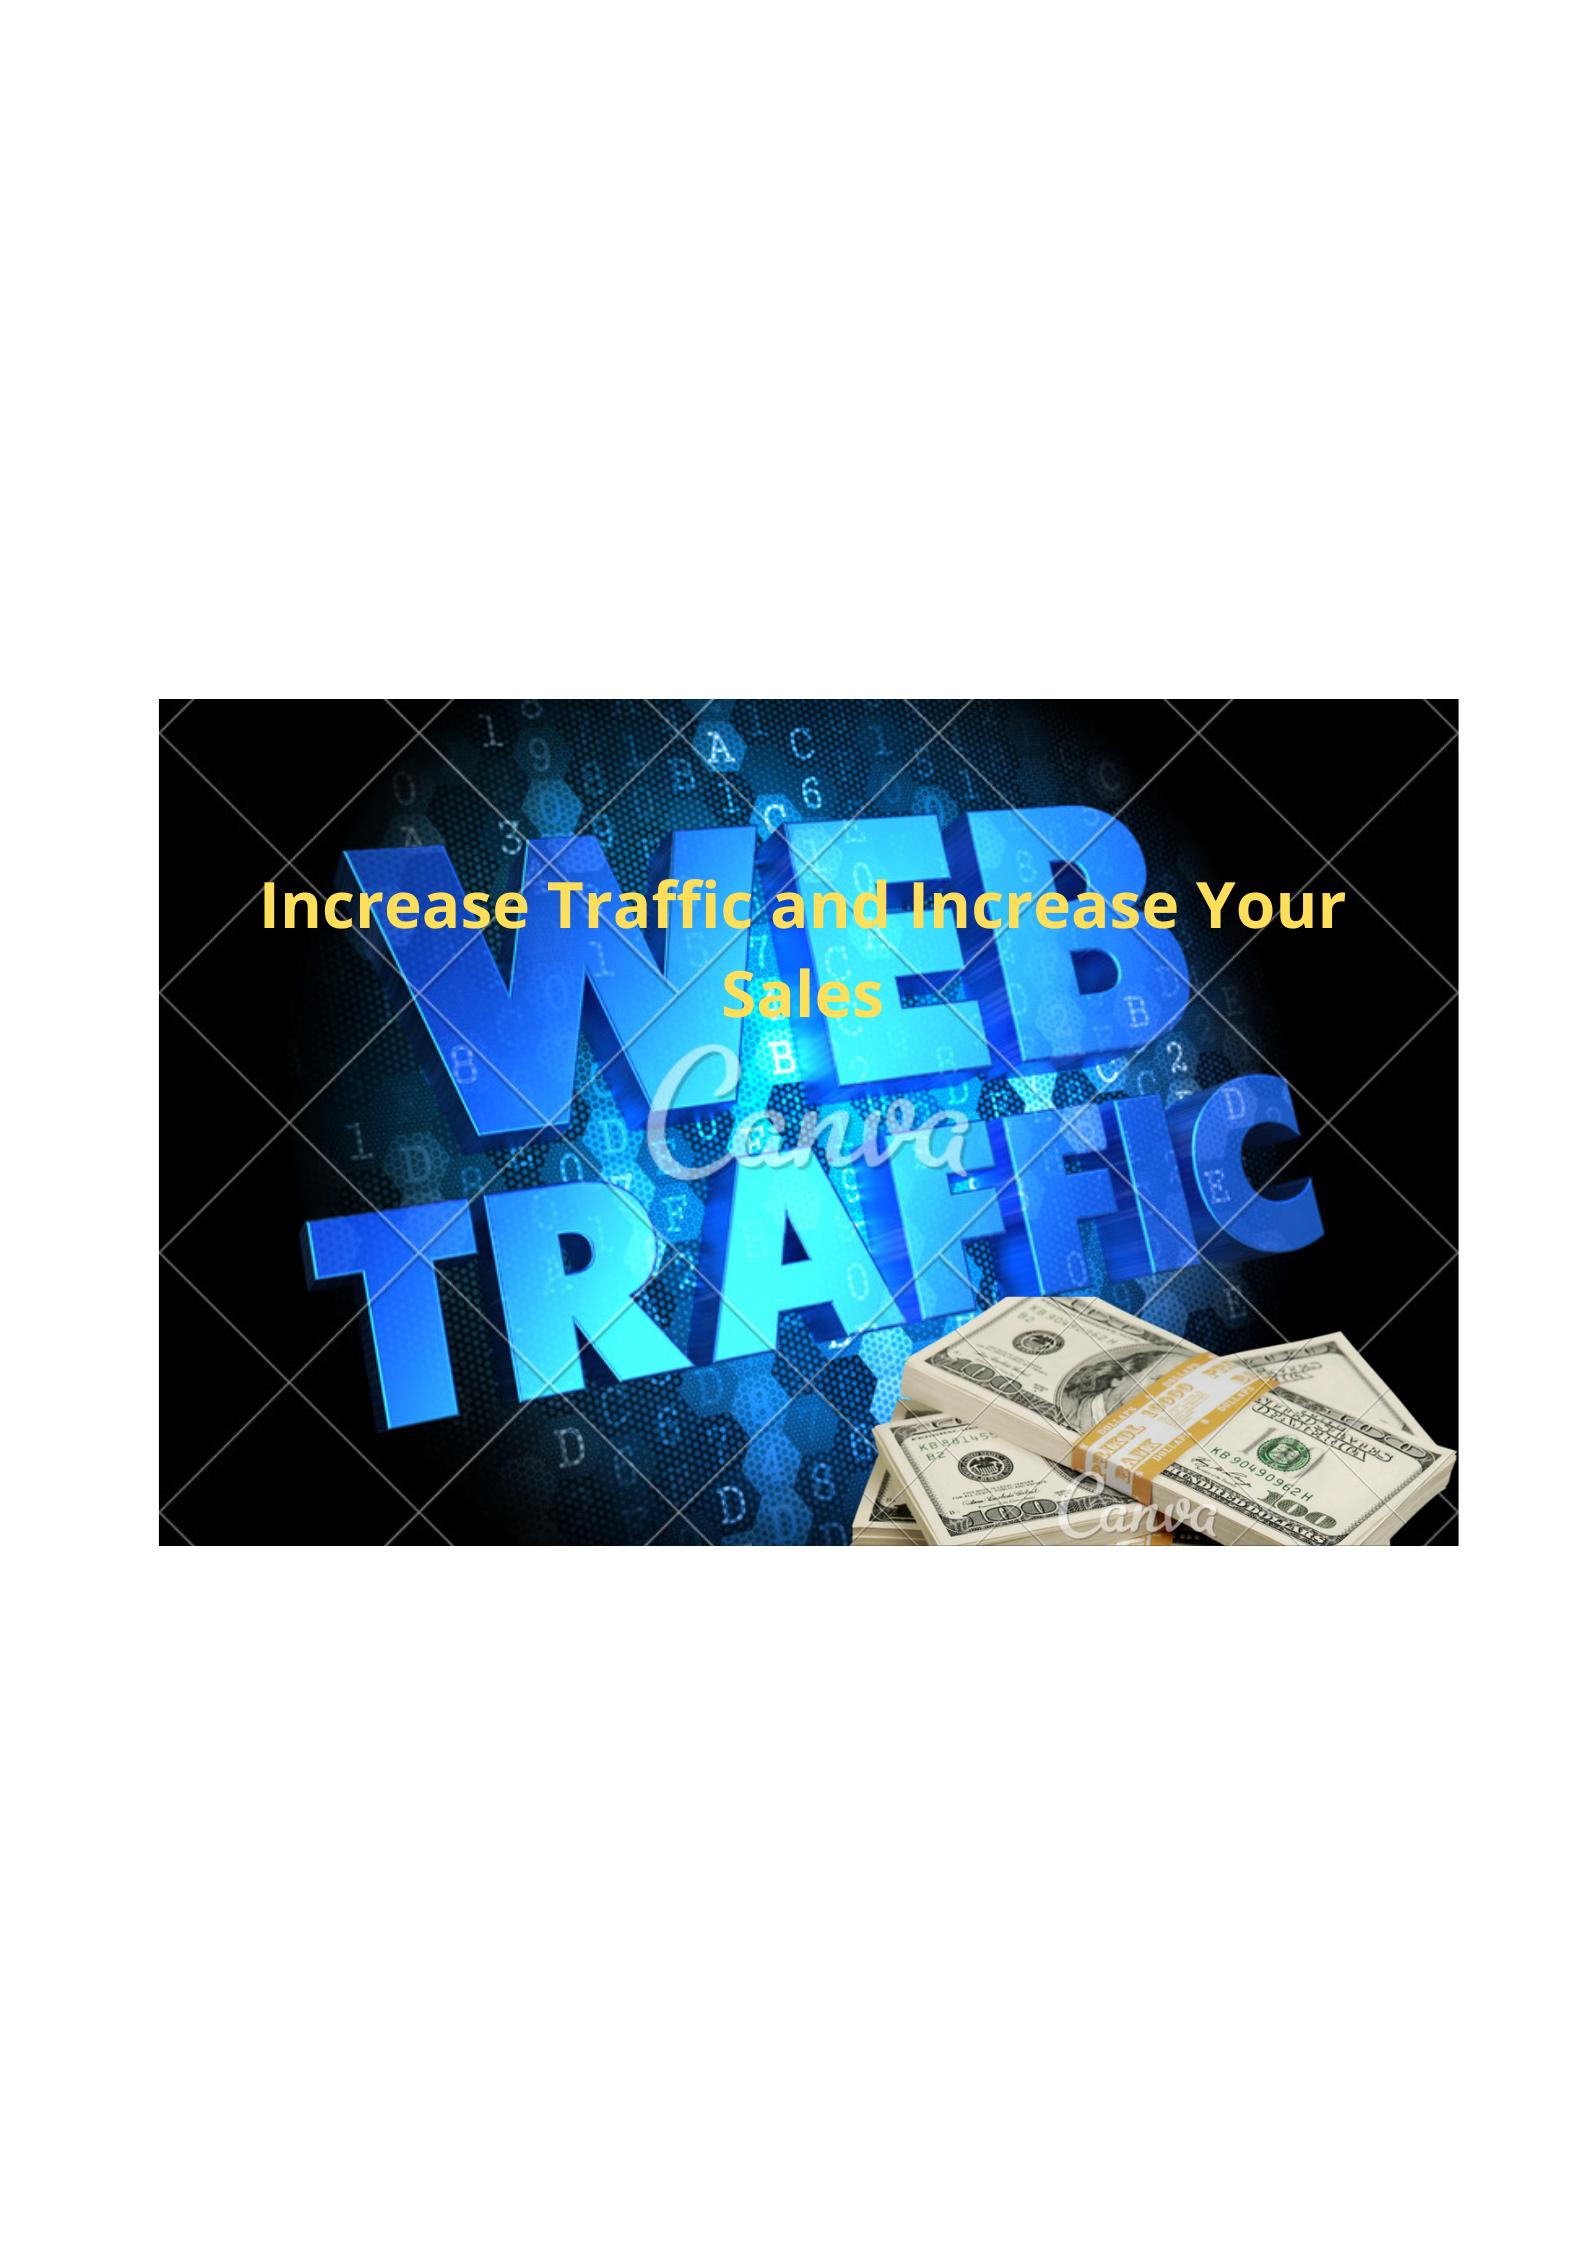 Increase Web Traffic and Increase Sales